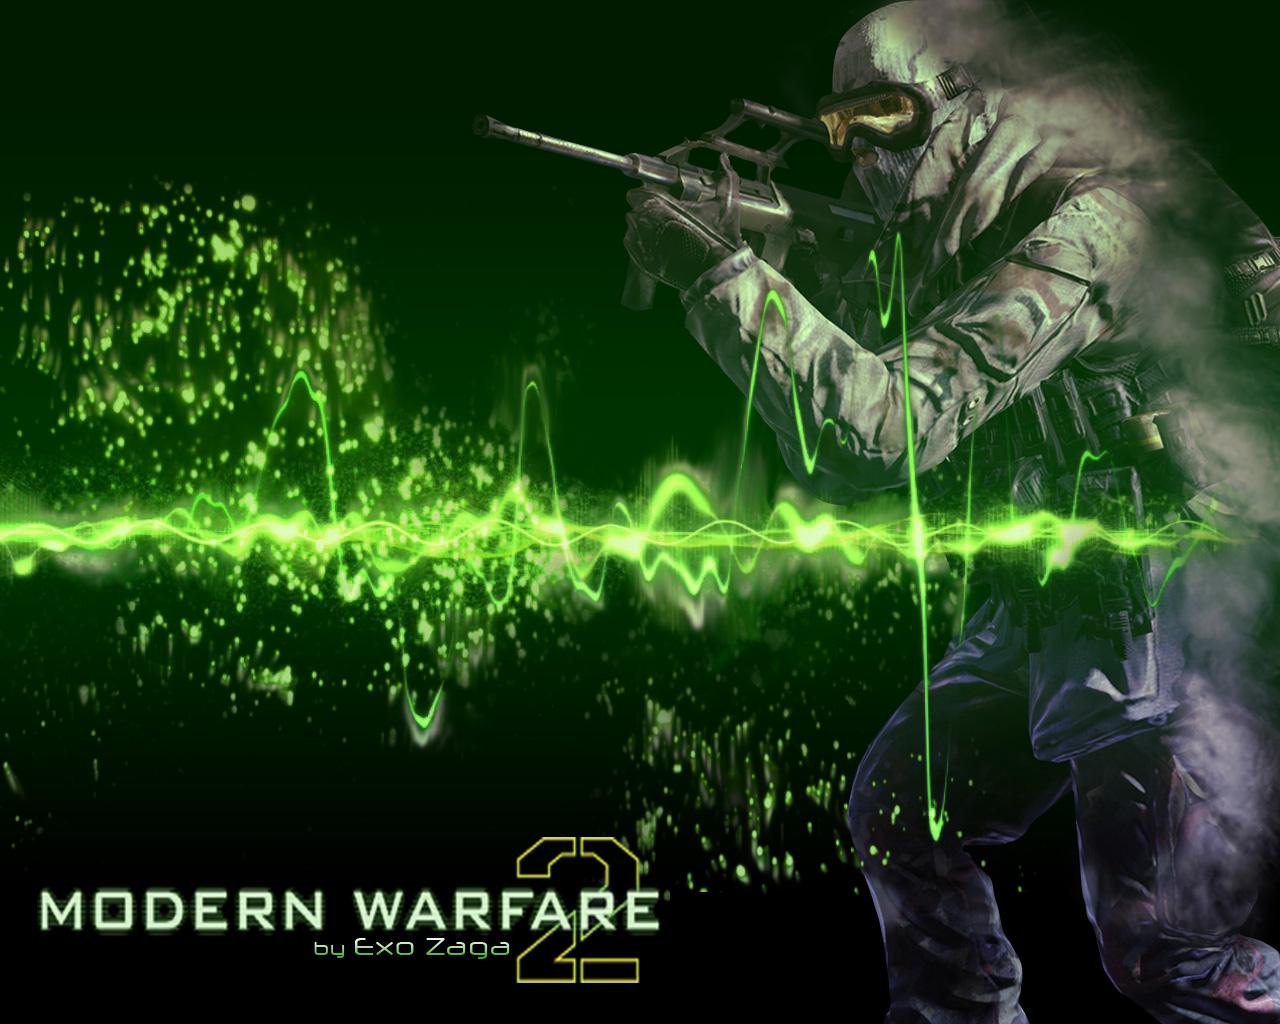 http://3.bp.blogspot.com/_rFsxxXfW-YI/TORiorzOwGI/AAAAAAAAAA4/GcnyF31kEIo/s1600/modern-warfare-2-wallpaper.jpg